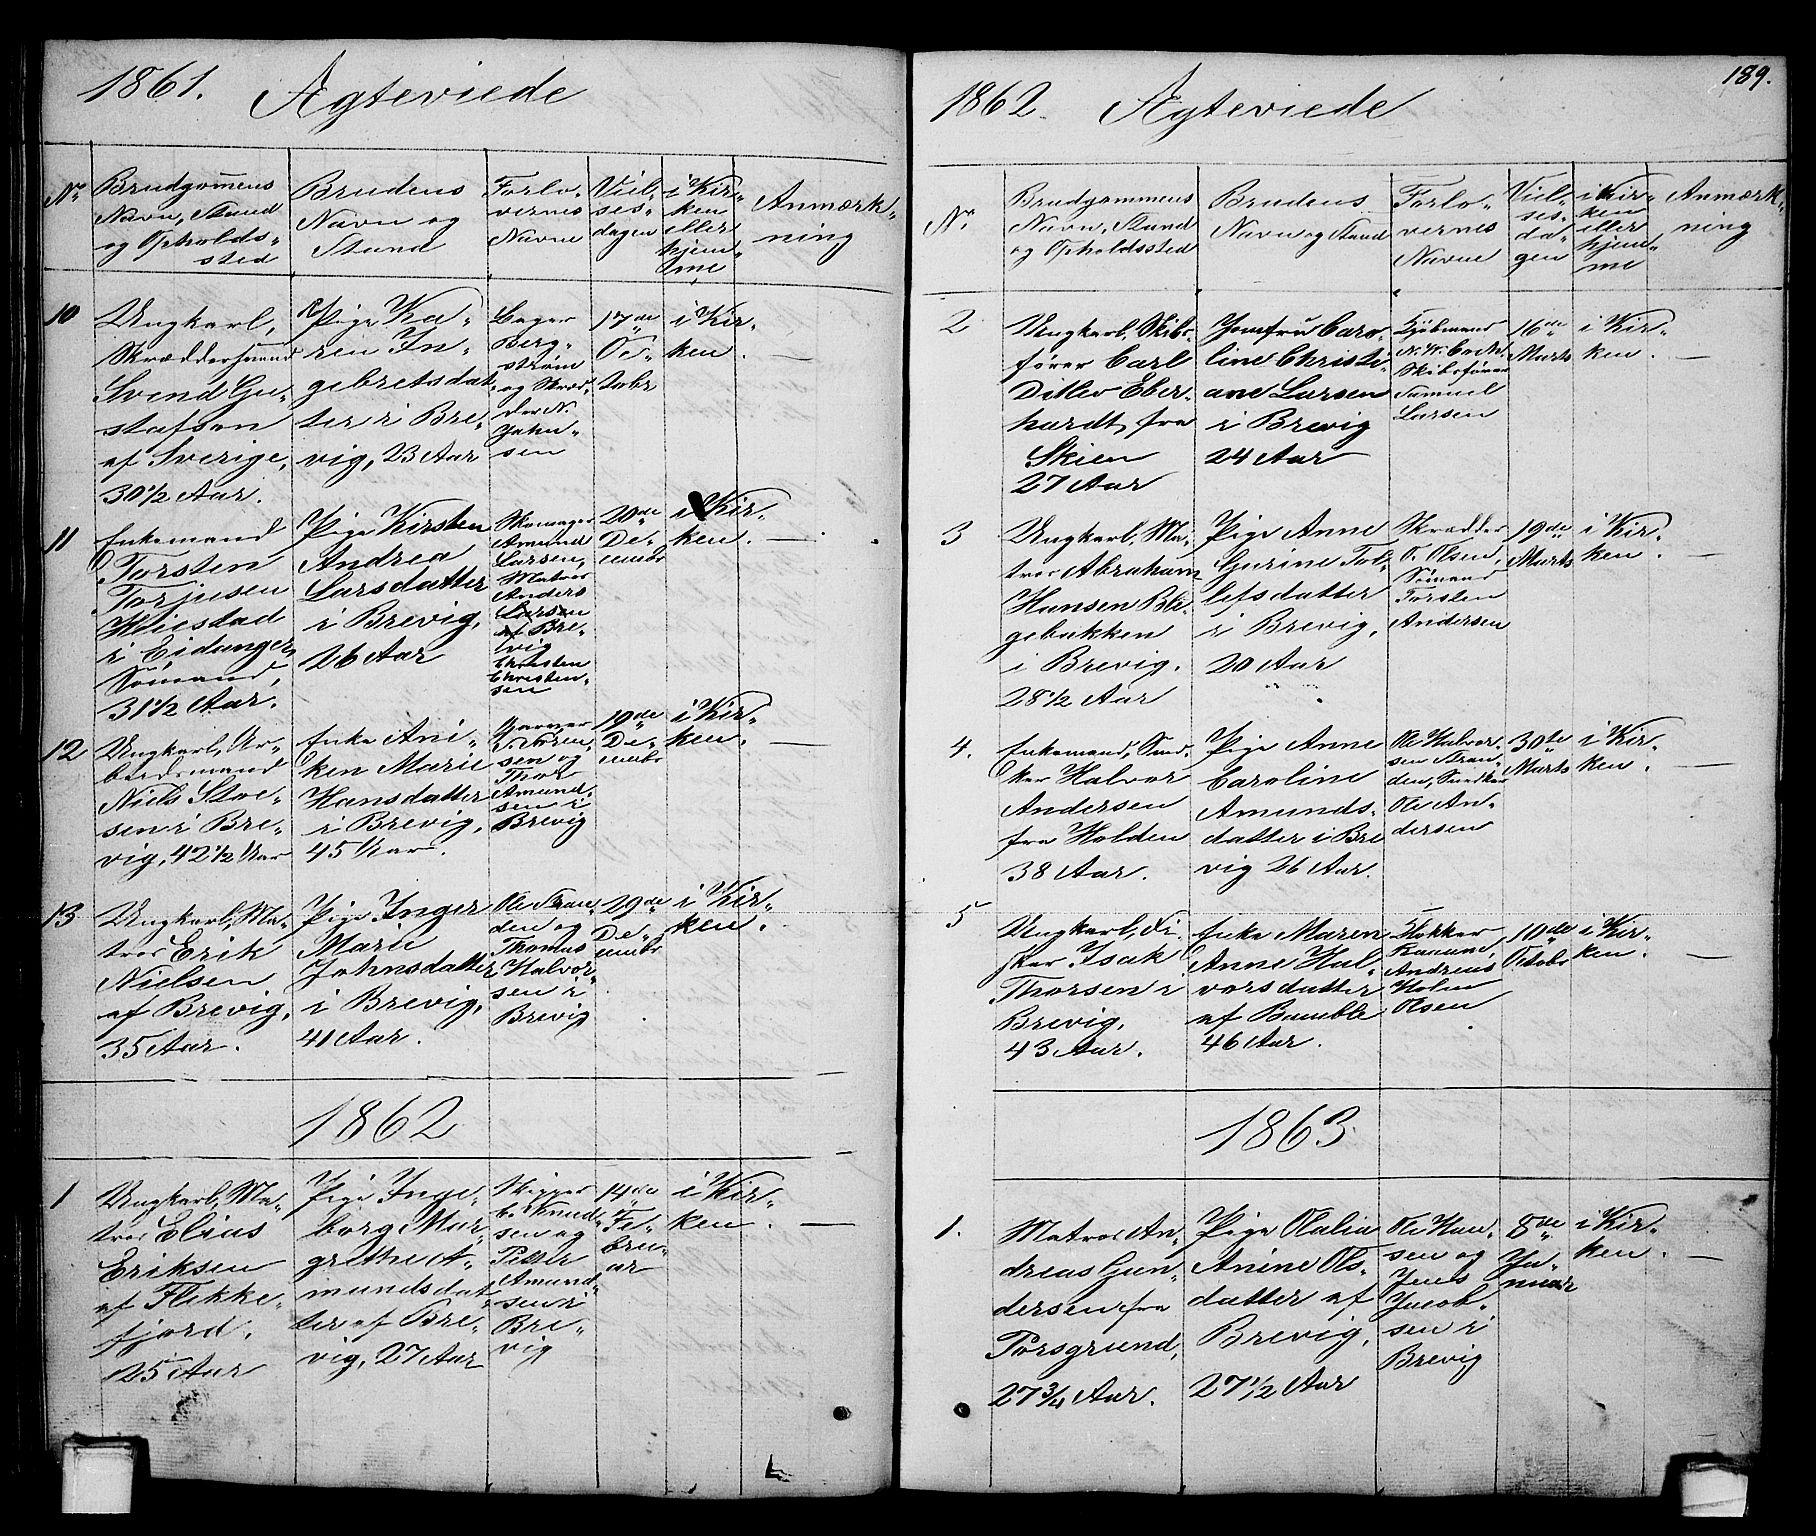 SAKO, Brevik kirkebøker, G/Ga/L0002: Klokkerbok nr. 2, 1846-1865, s. 189